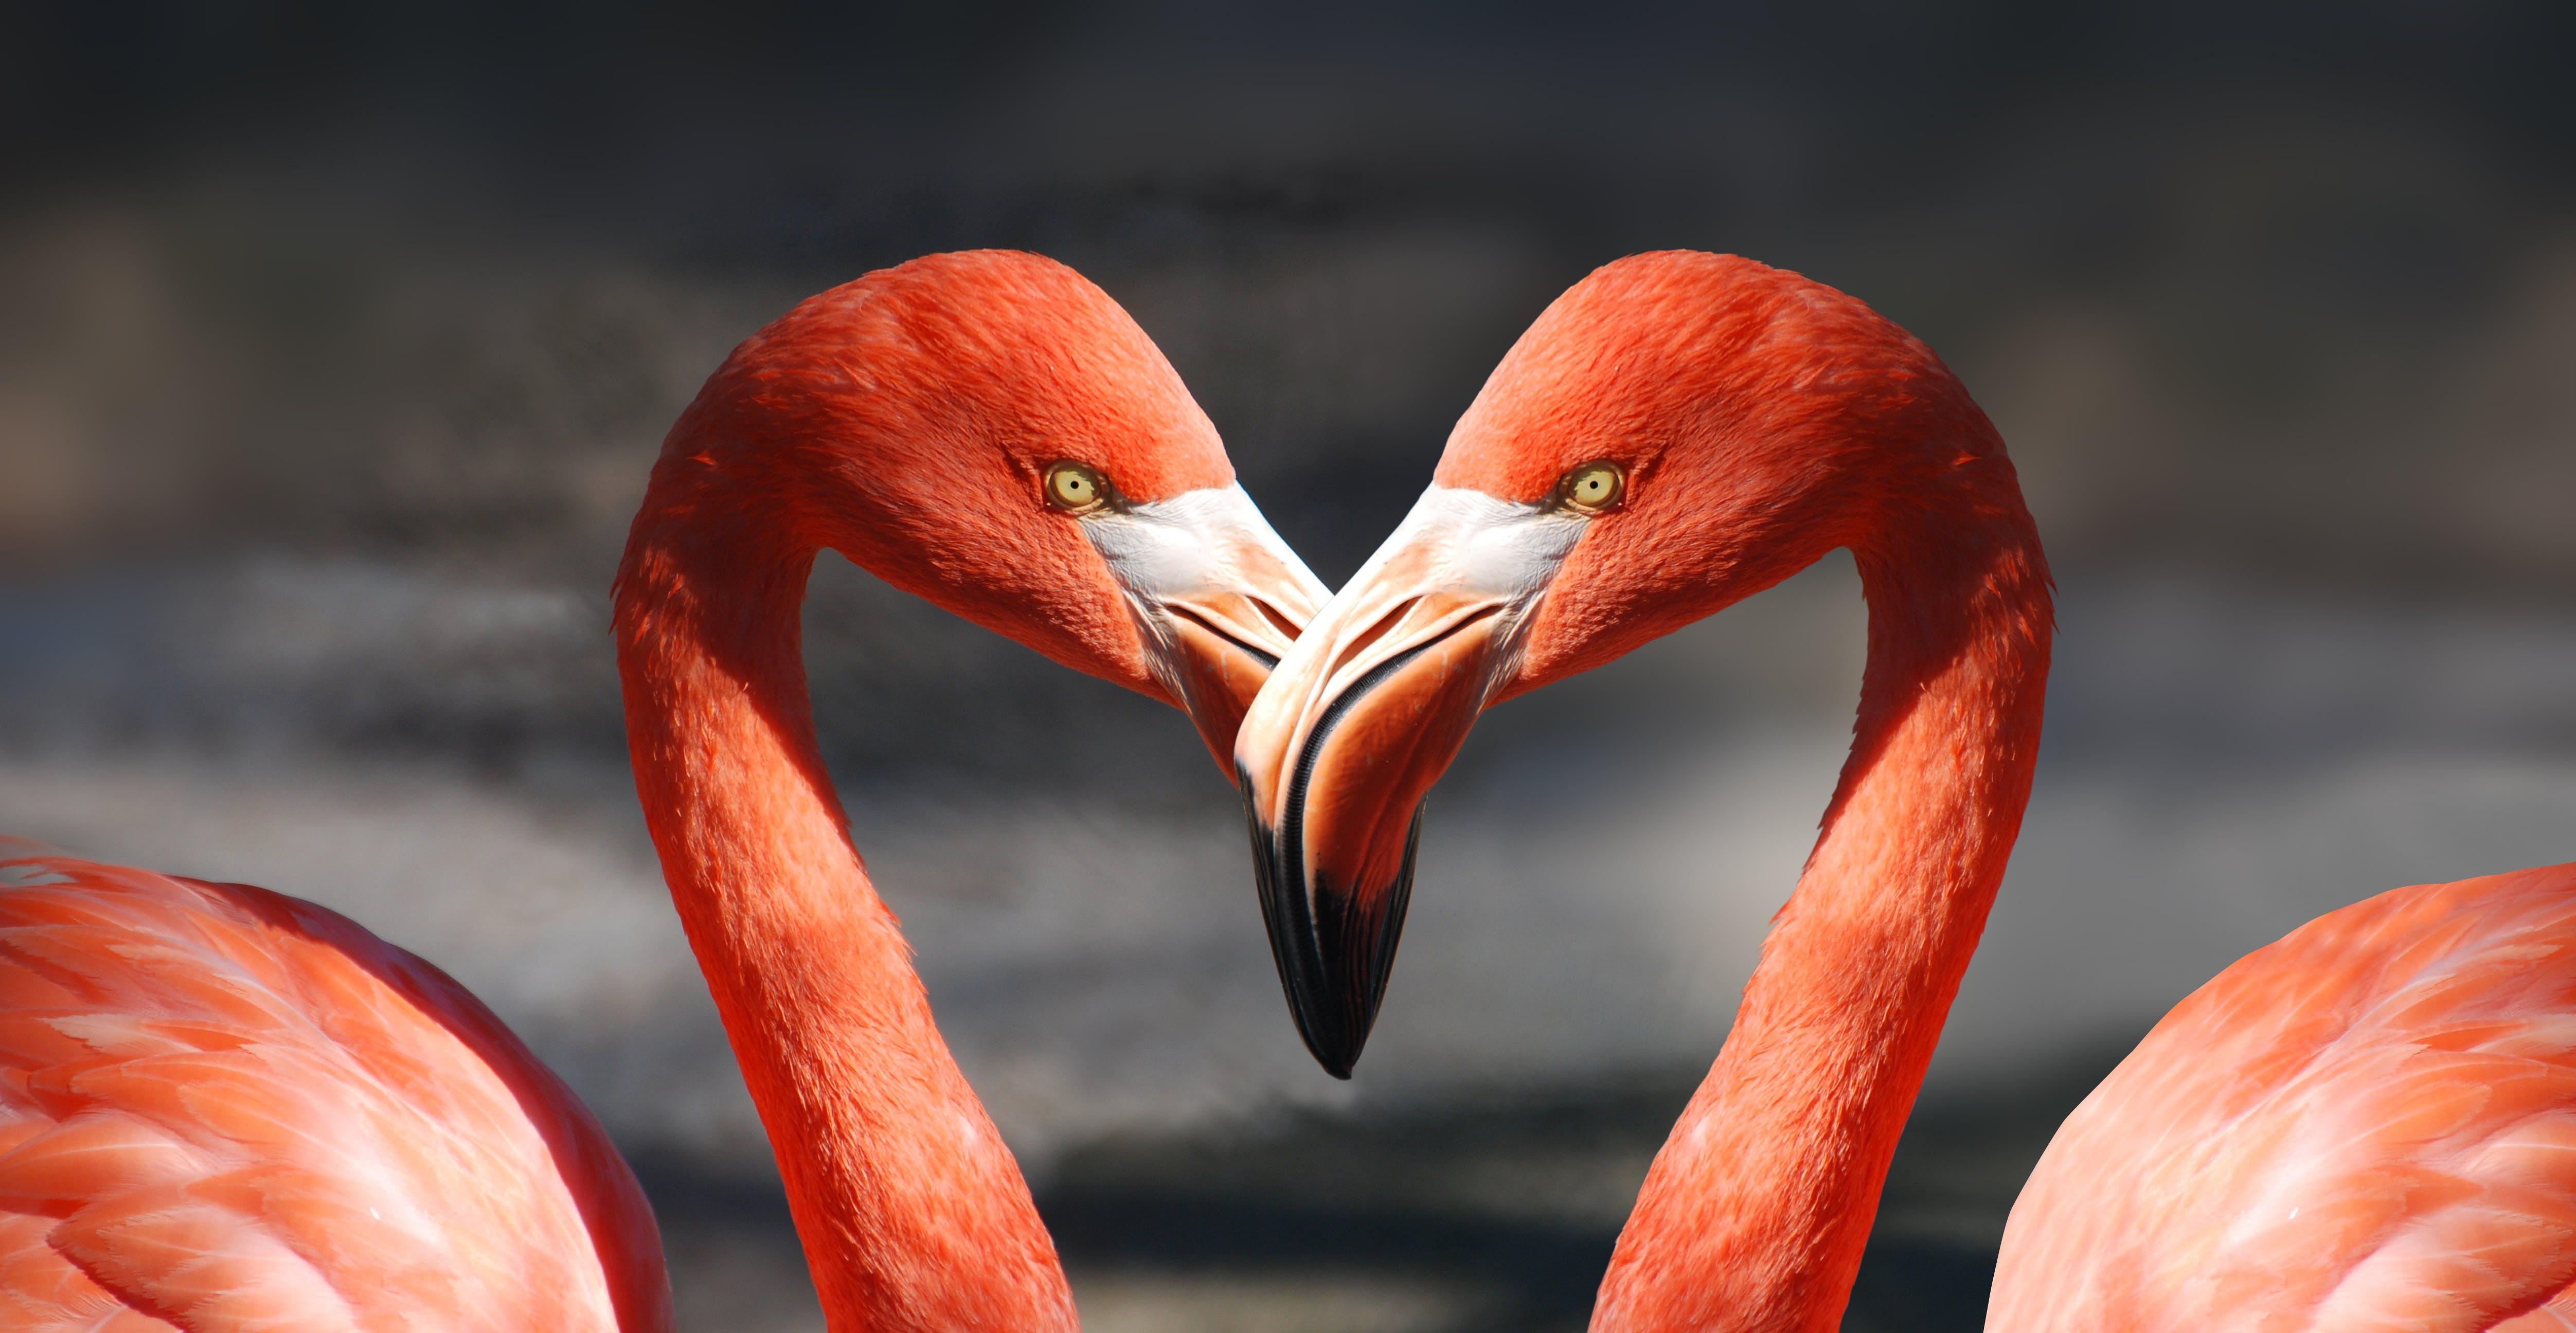 animals, birds, feathers